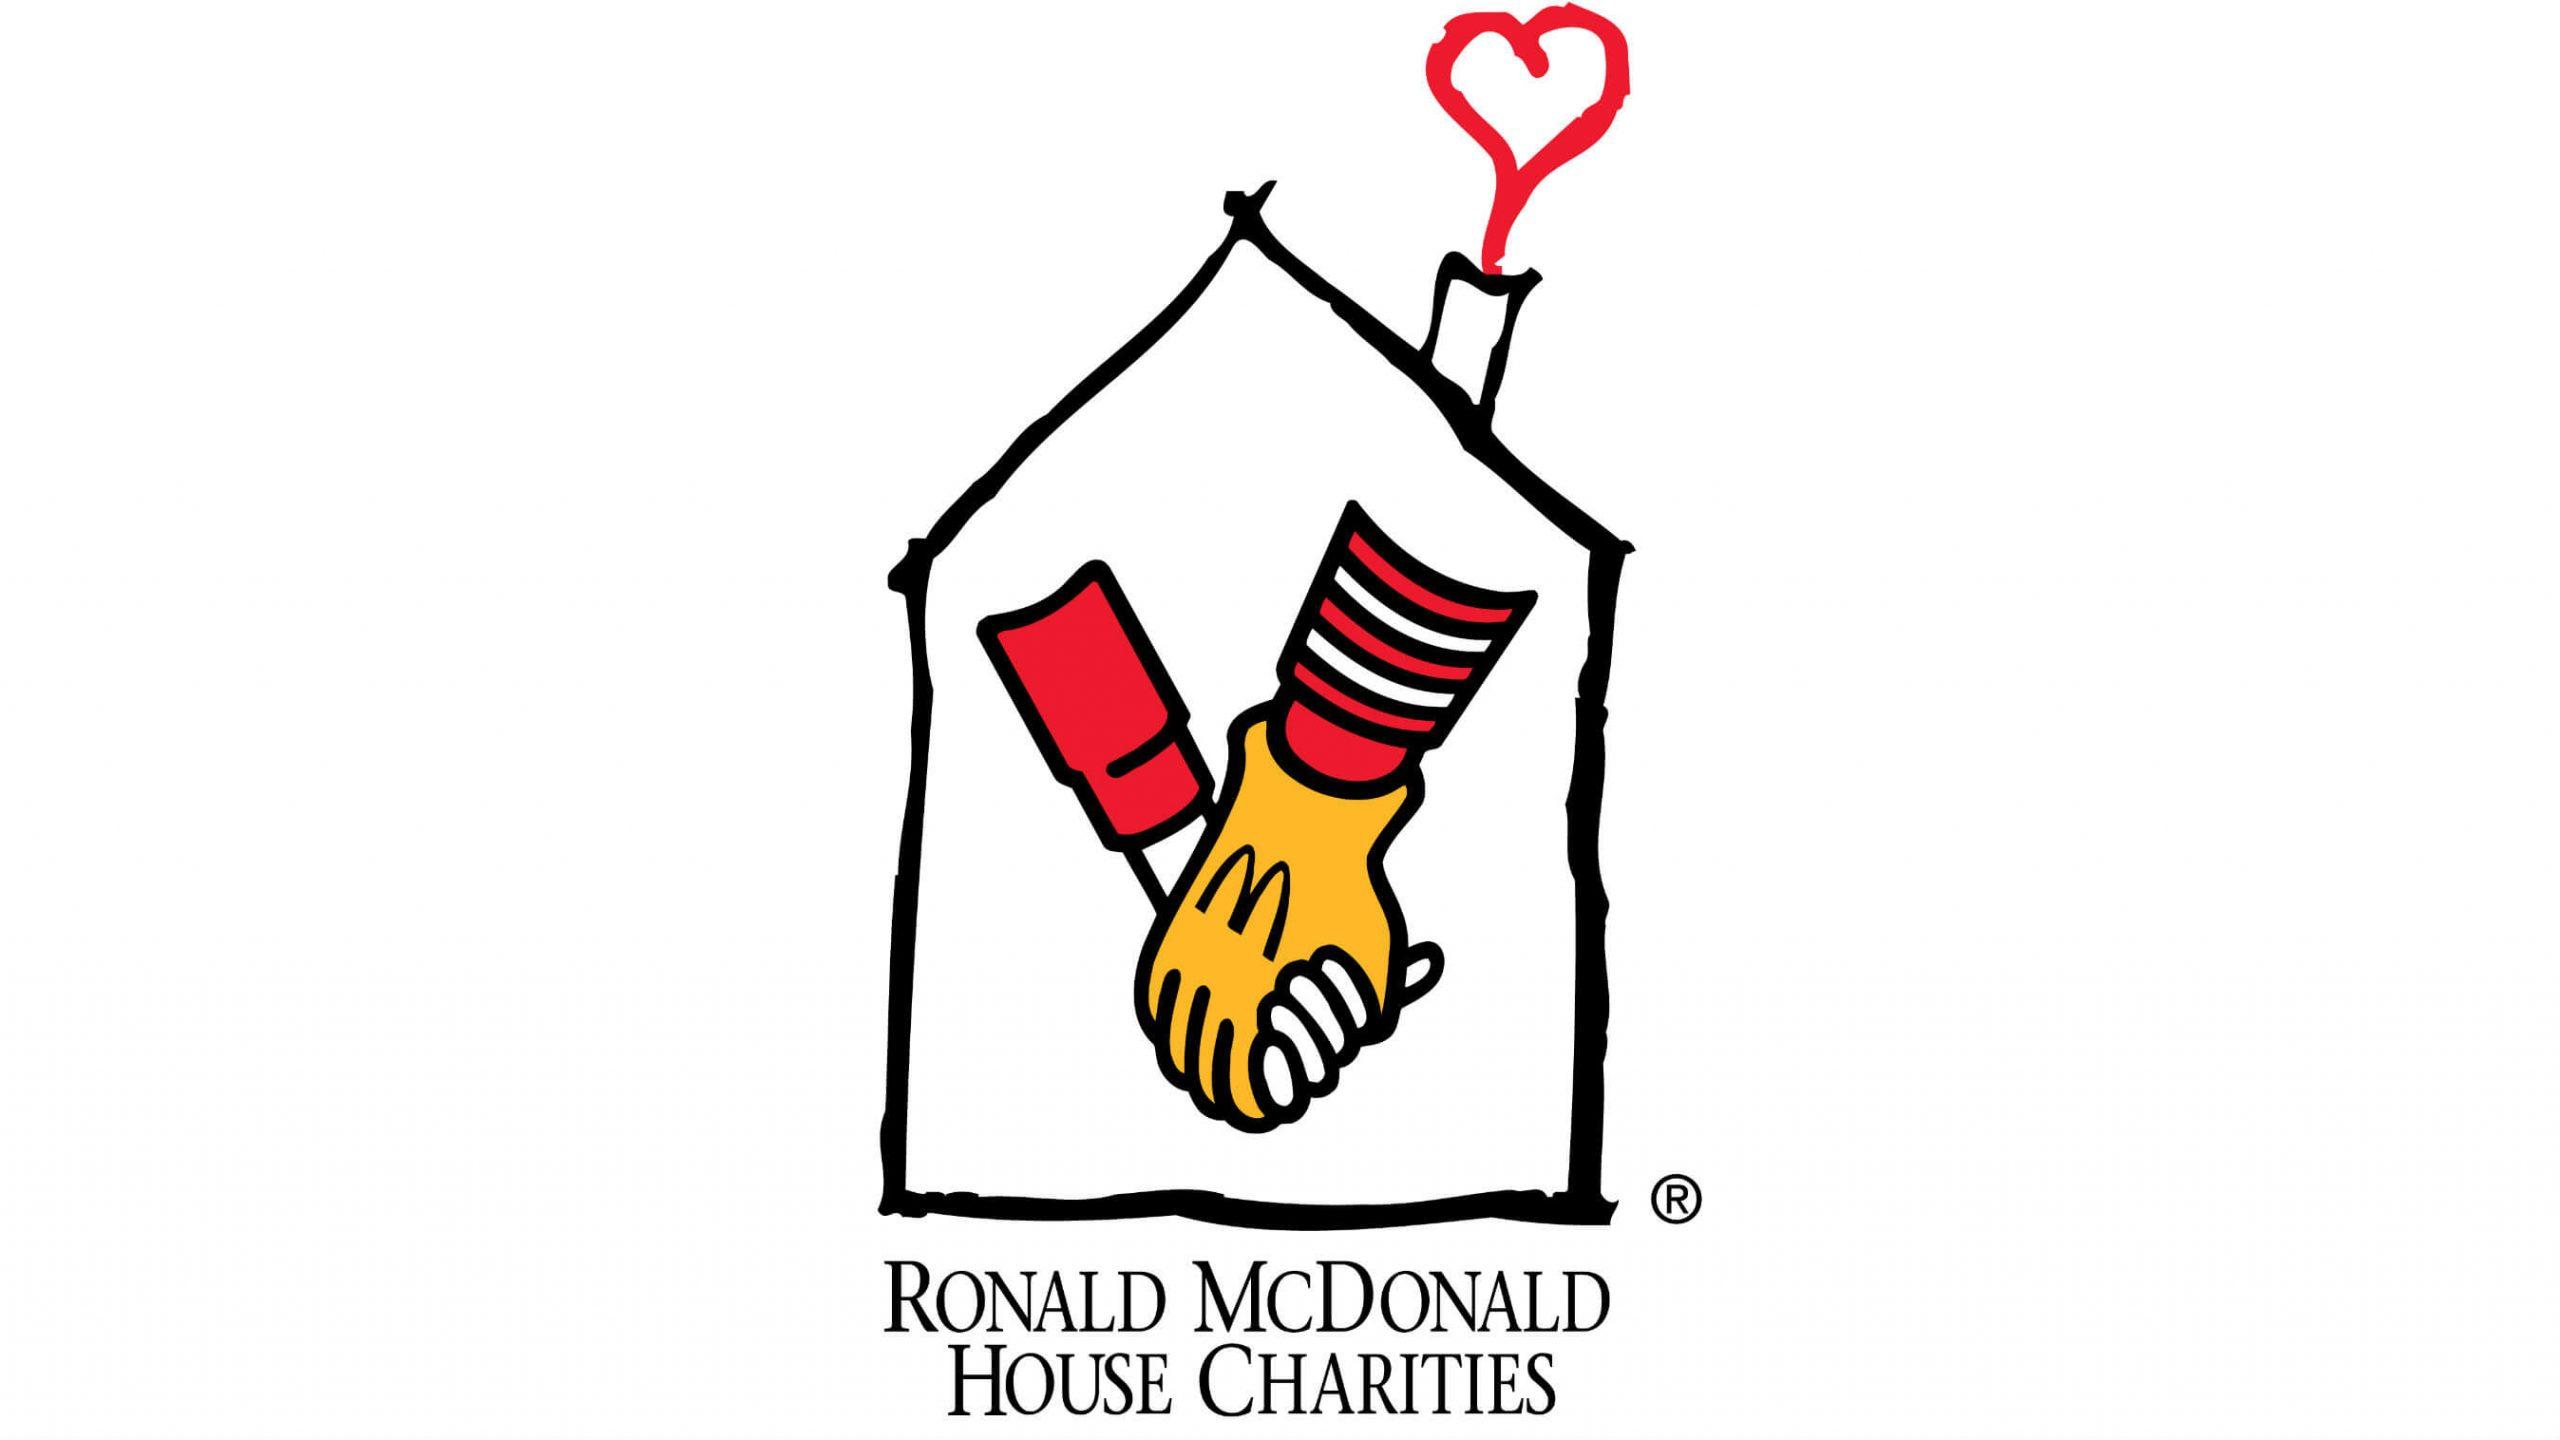 https://jthowefunerals.co.uk/wp-content/uploads/2021/04/Ronald-McDonald-Logo-scaled.jpg